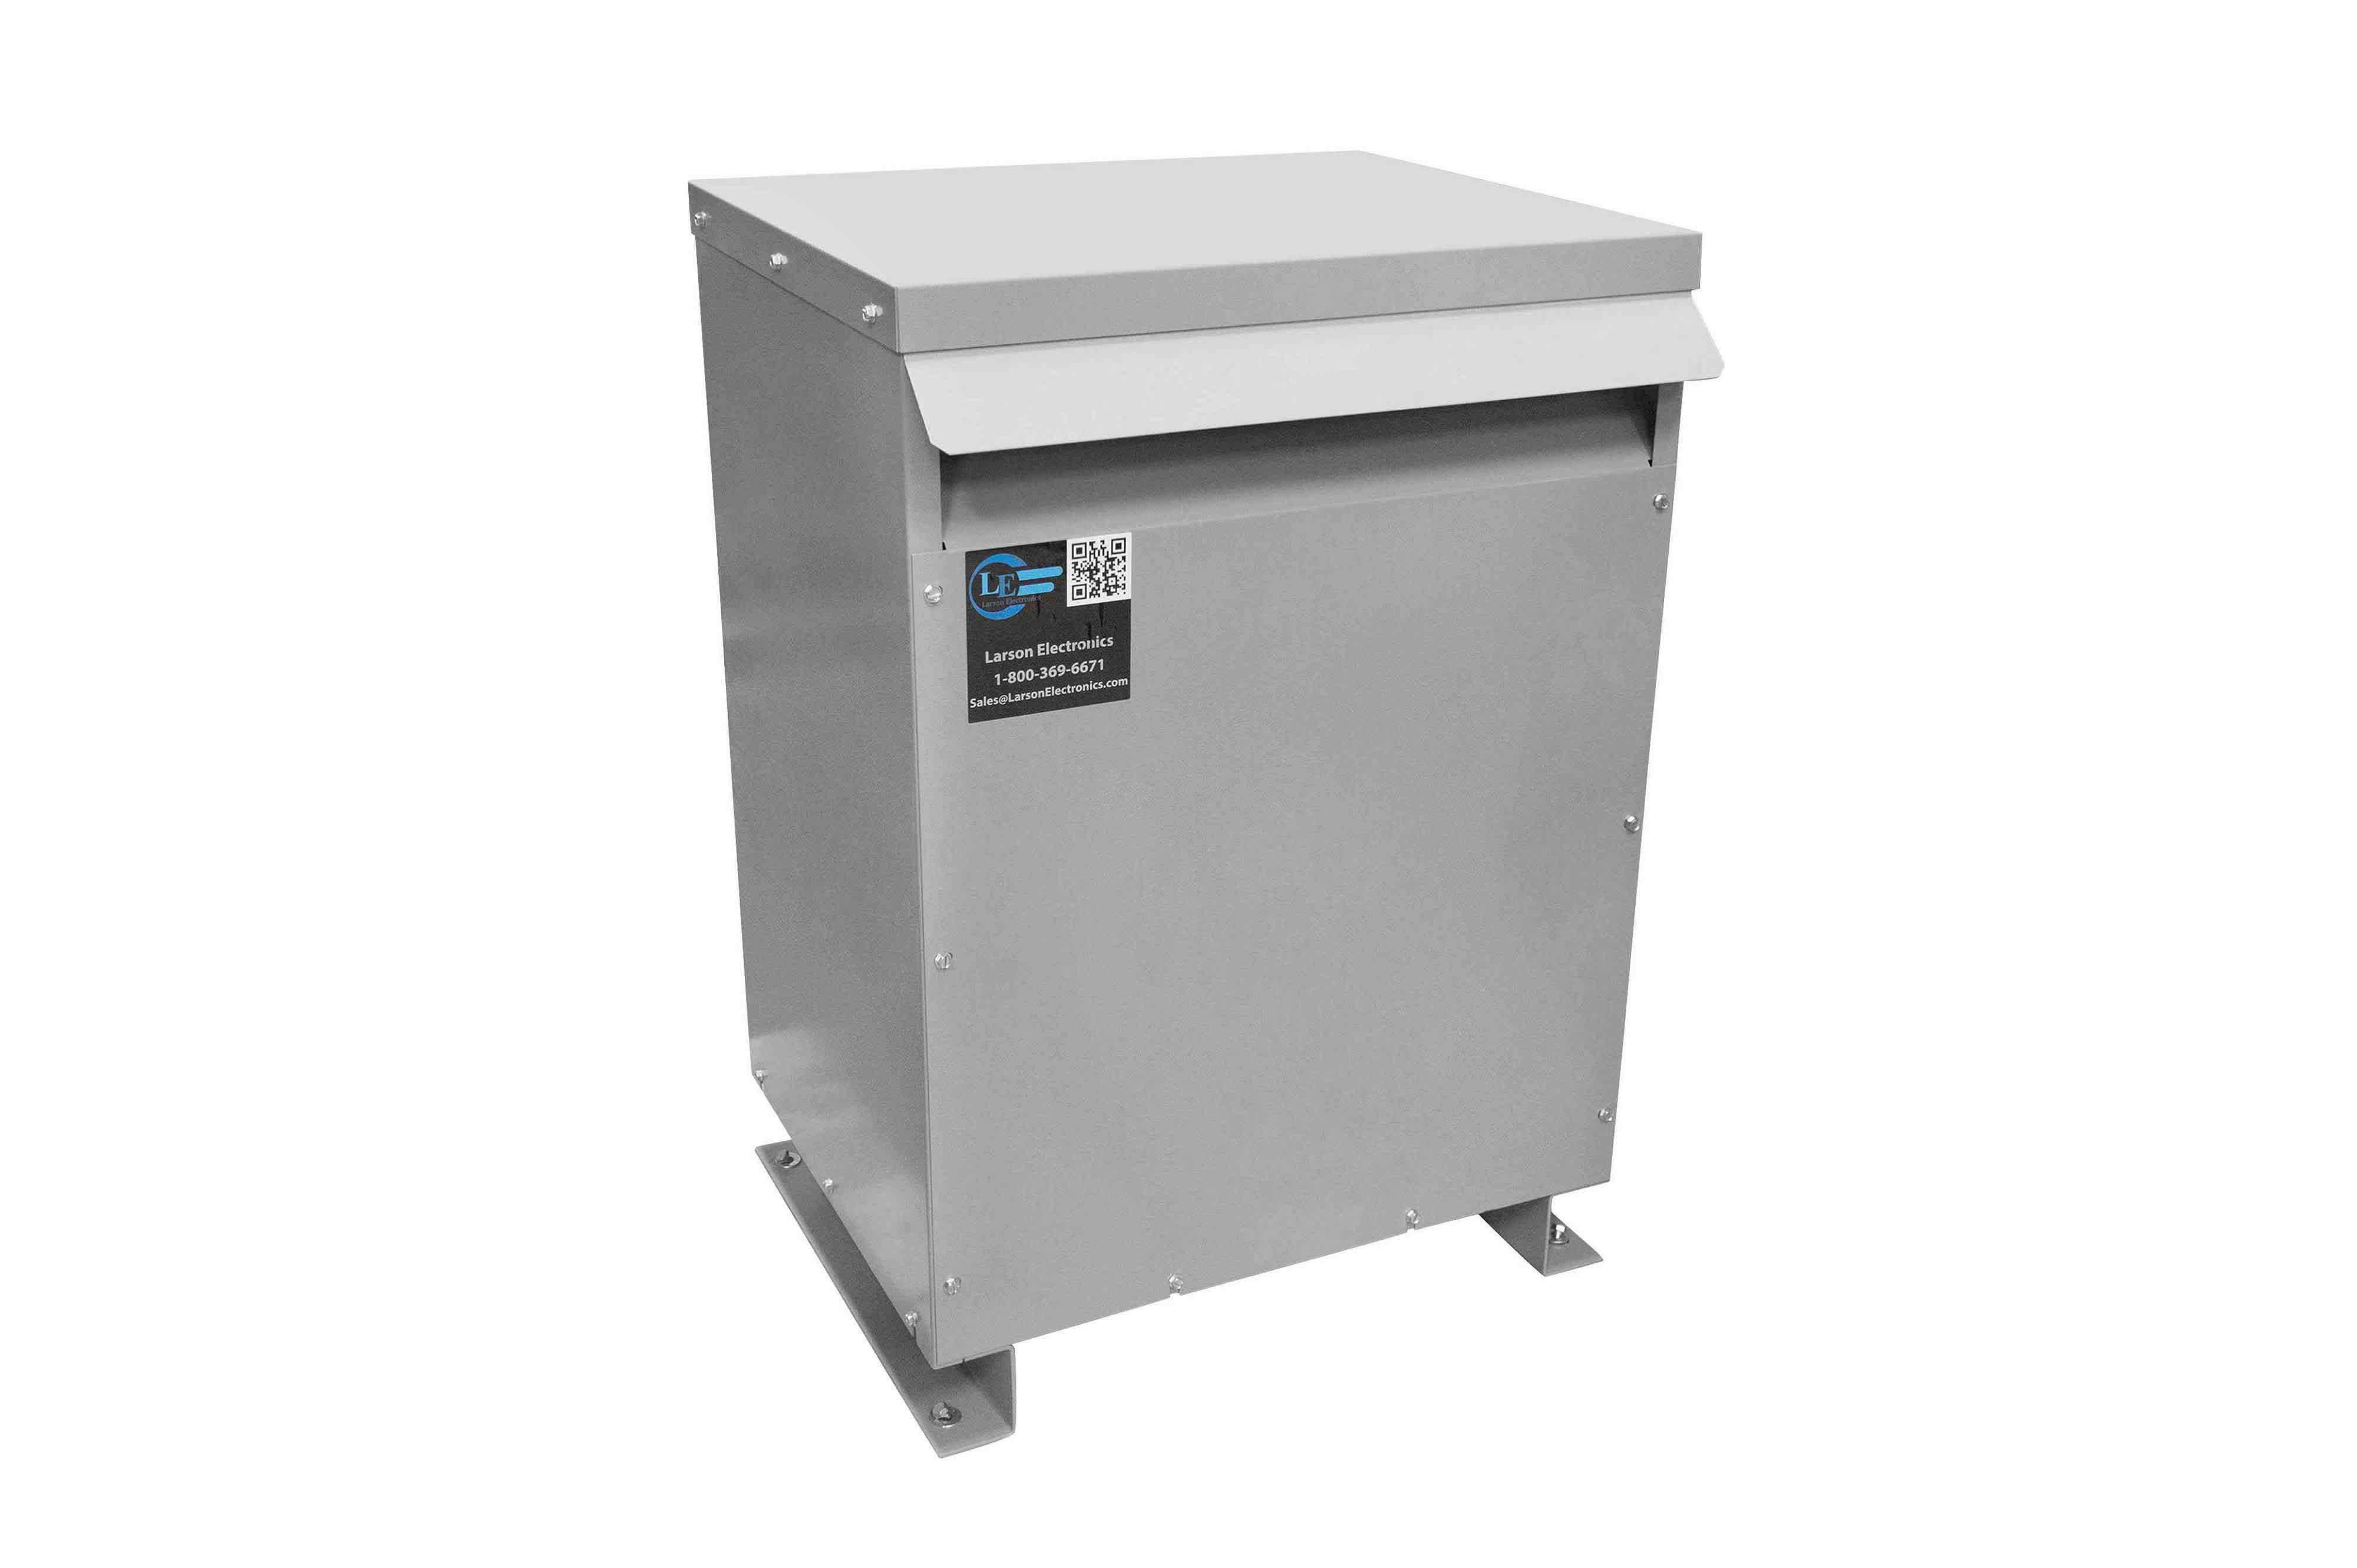 400 kVA 3PH Isolation Transformer, 460V Wye Primary, 415V Delta Secondary, N3R, Ventilated, 60 Hz